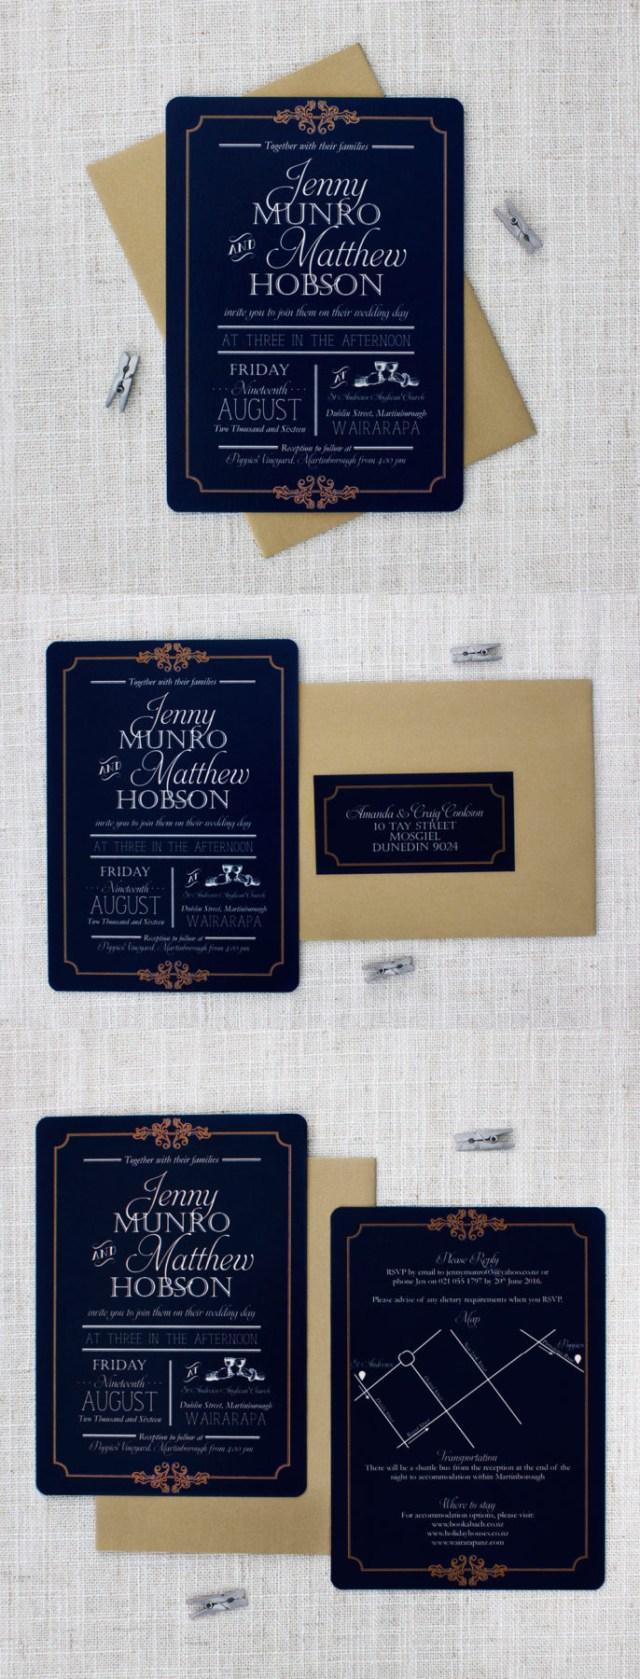 Wedding Invitations Gold Elegant Navy And Gold Wedding Invitation Be My Guest